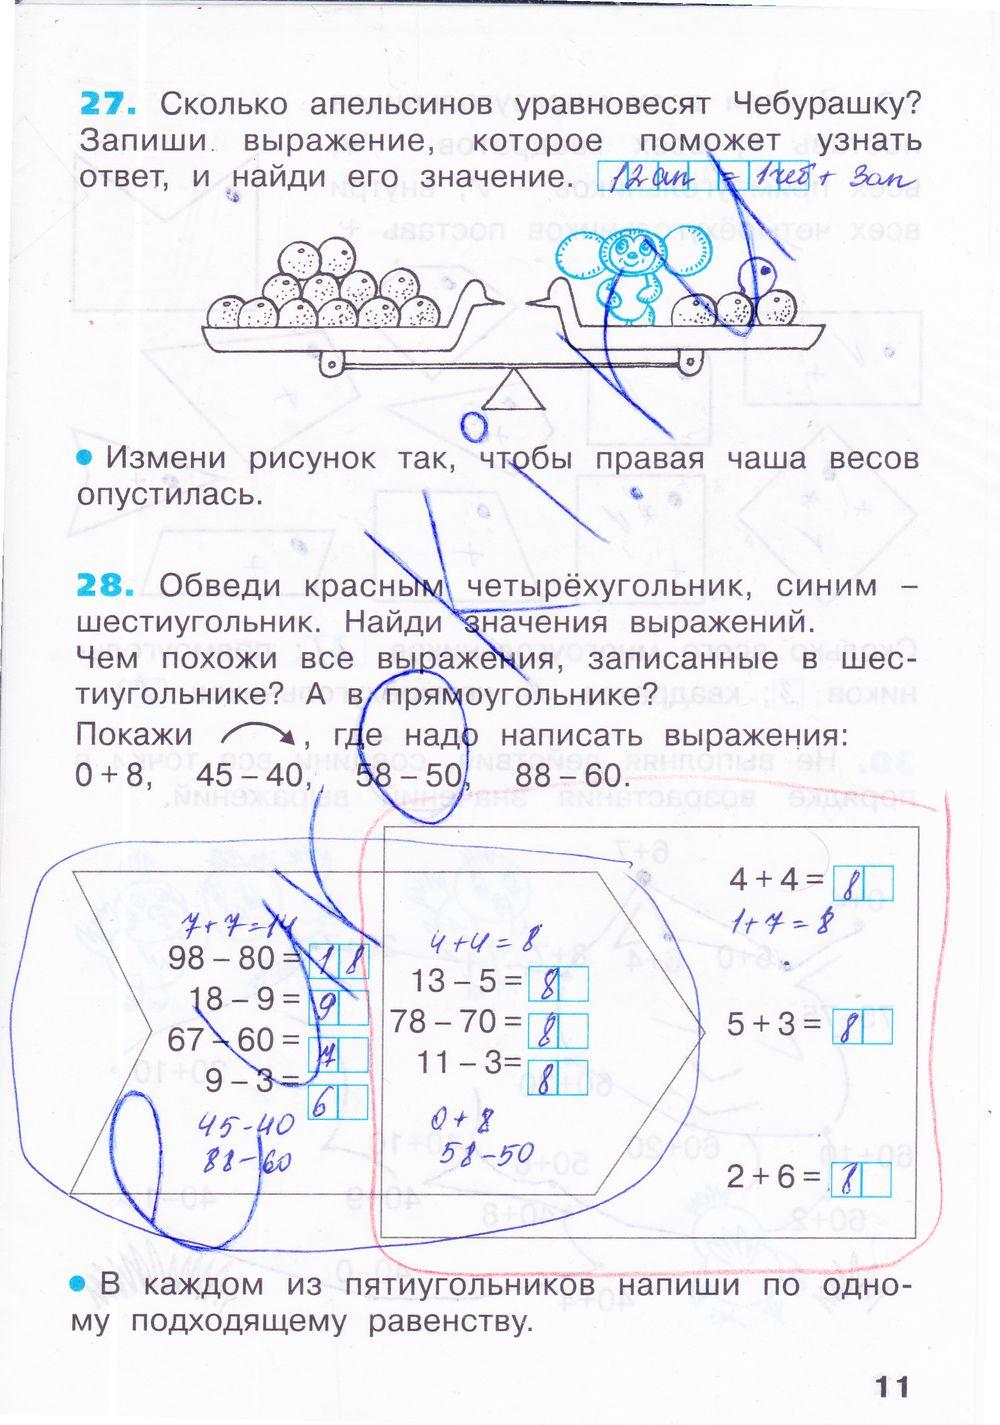 Скачать гдз по алгебре а.г.мордкович т.н.мишустина е.е.тульчинская на класс